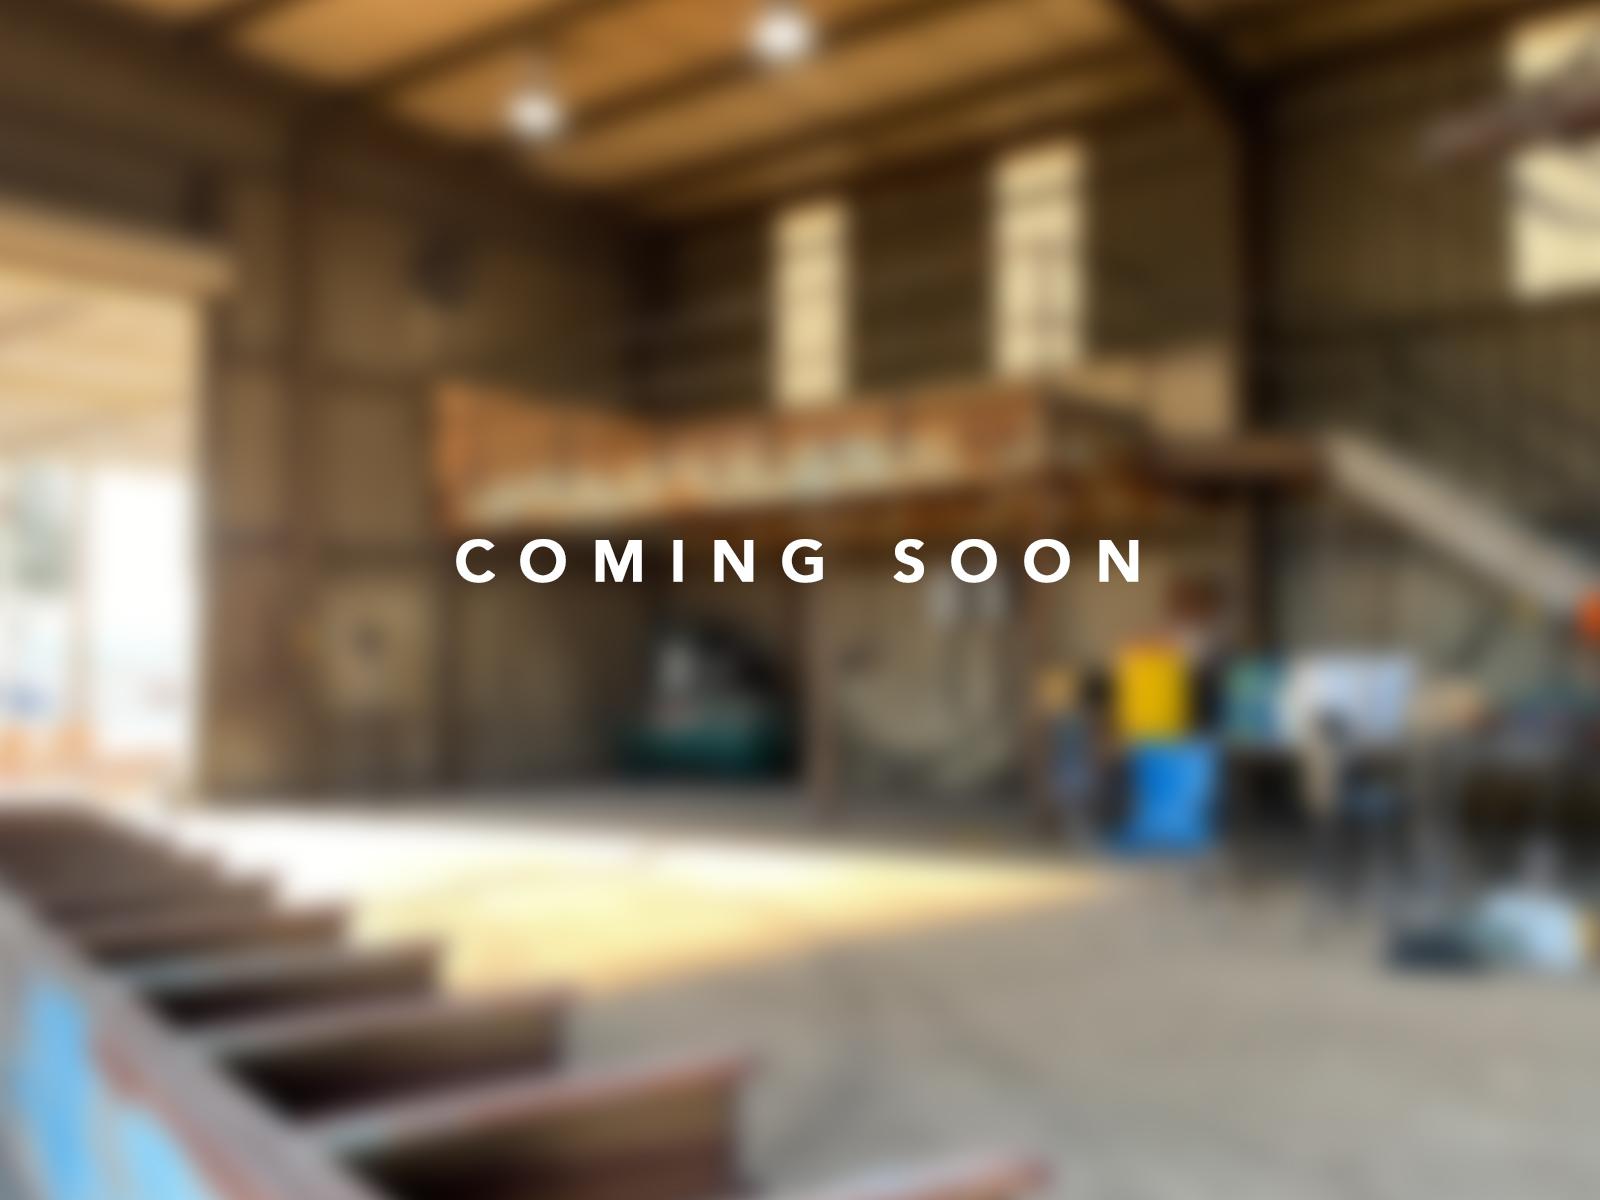 Coming Soon! COMINGSOON